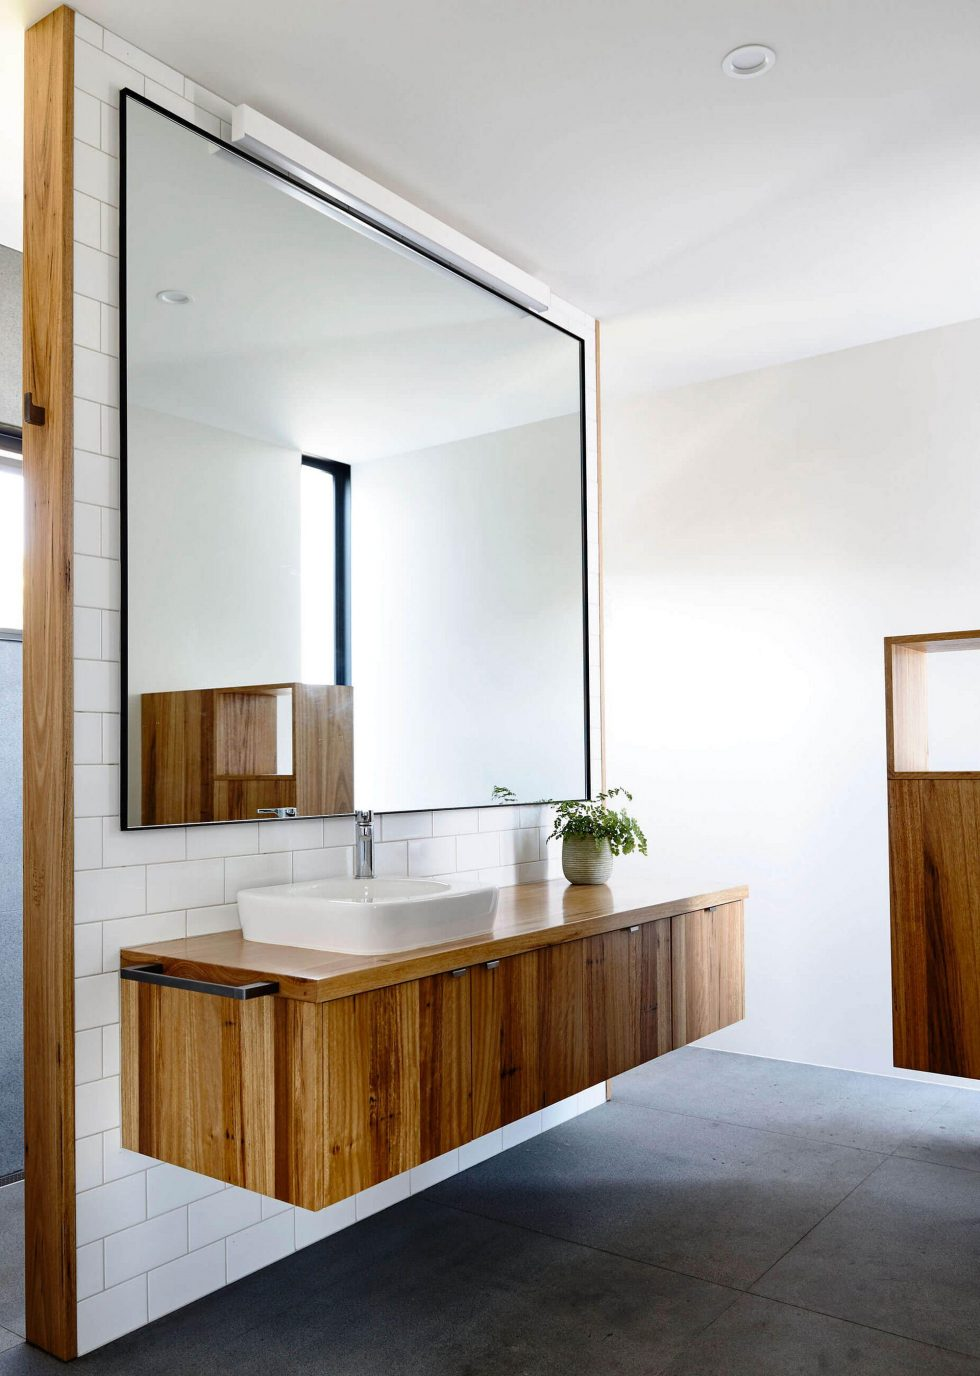 Contemporary House Renovation Of The ХІХ-Century House By Ola Studio Australia 11